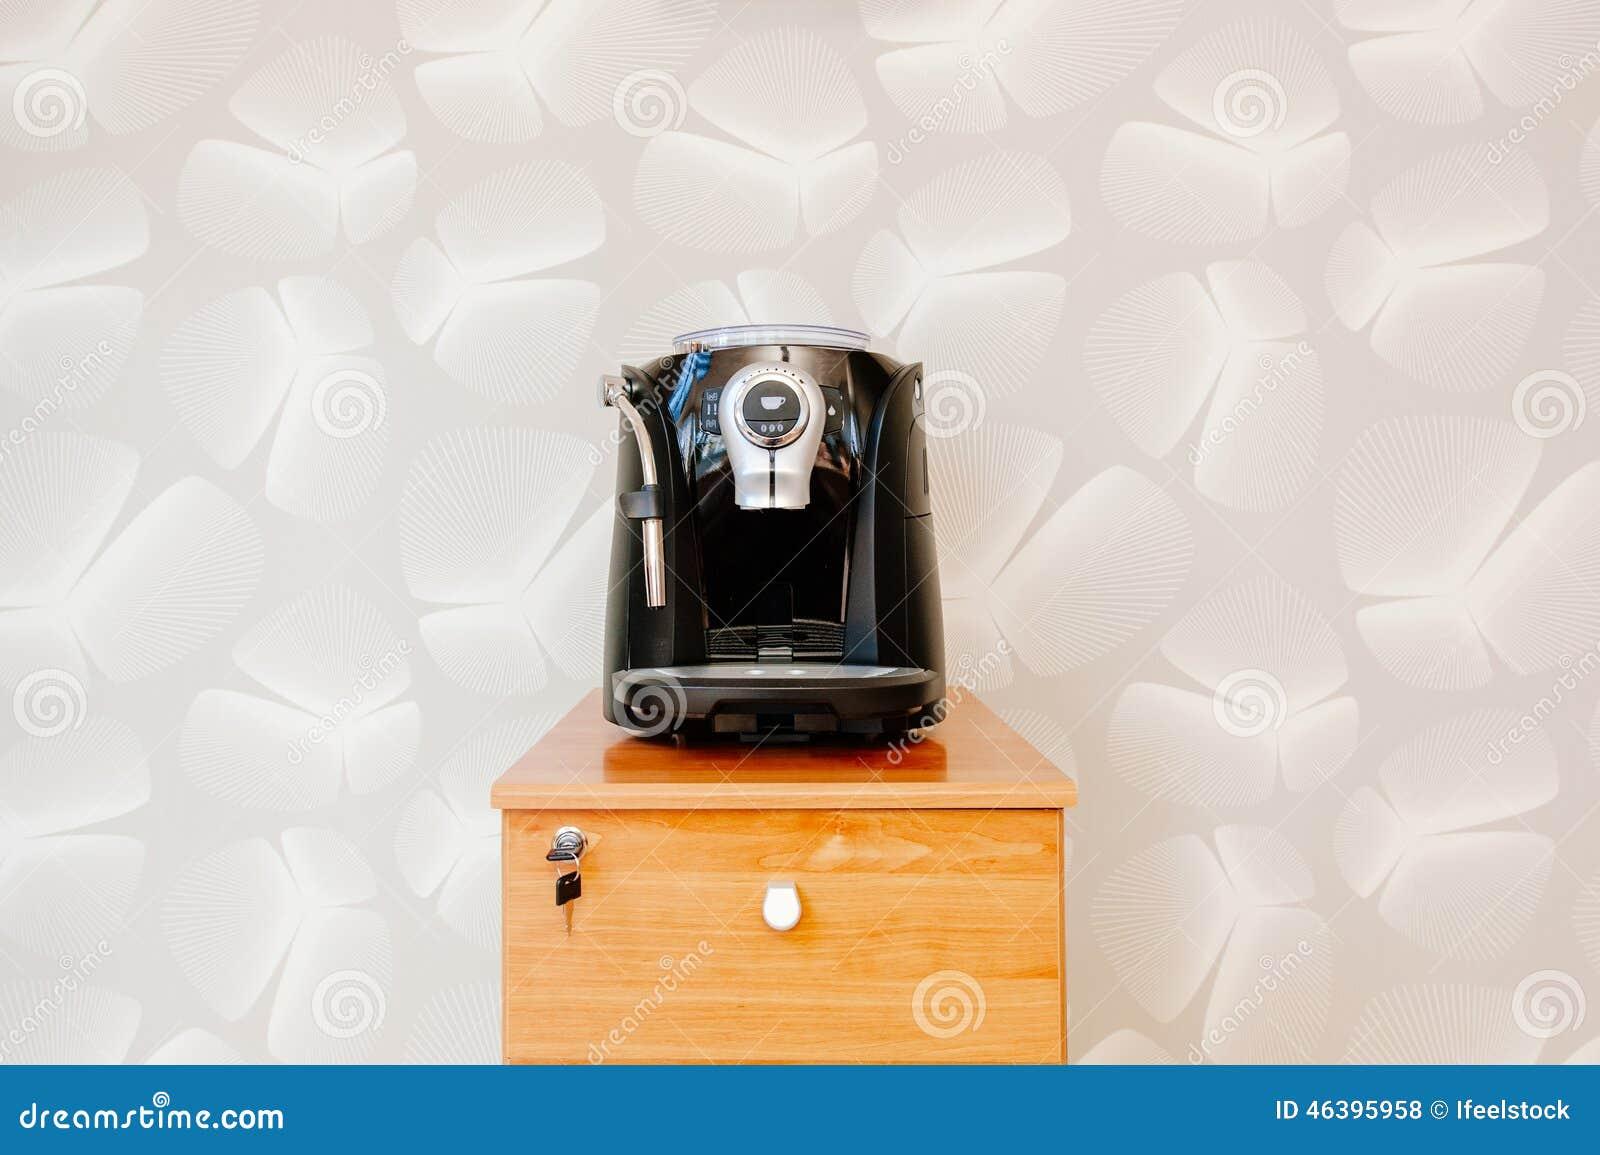 americano coffee machine